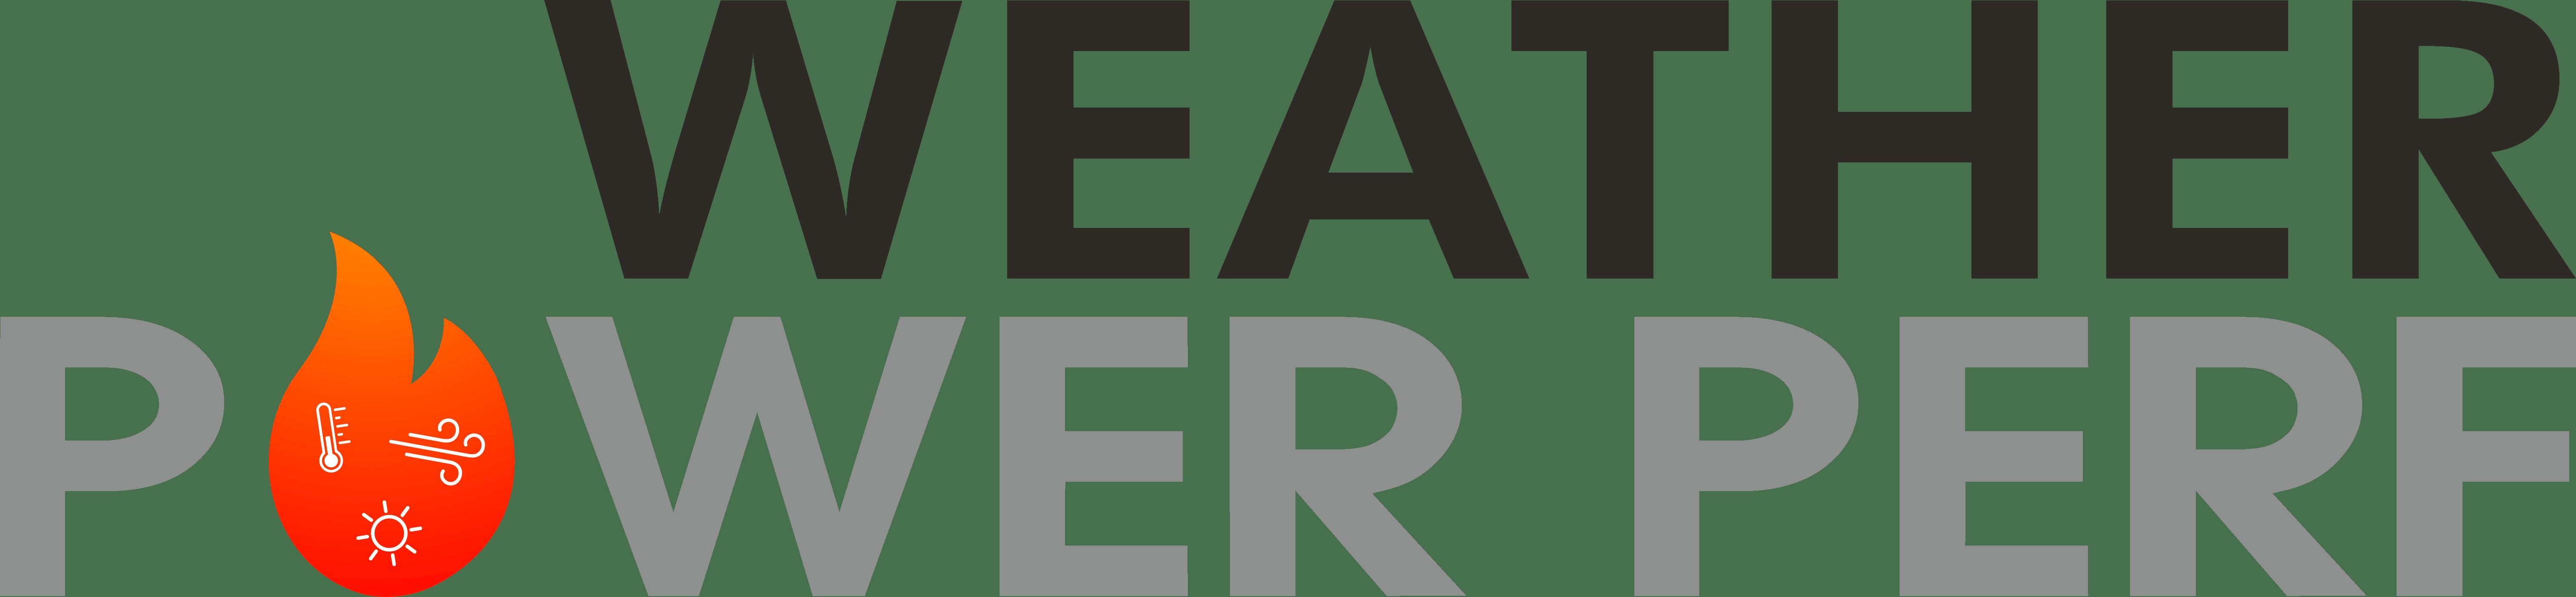 logo power pref